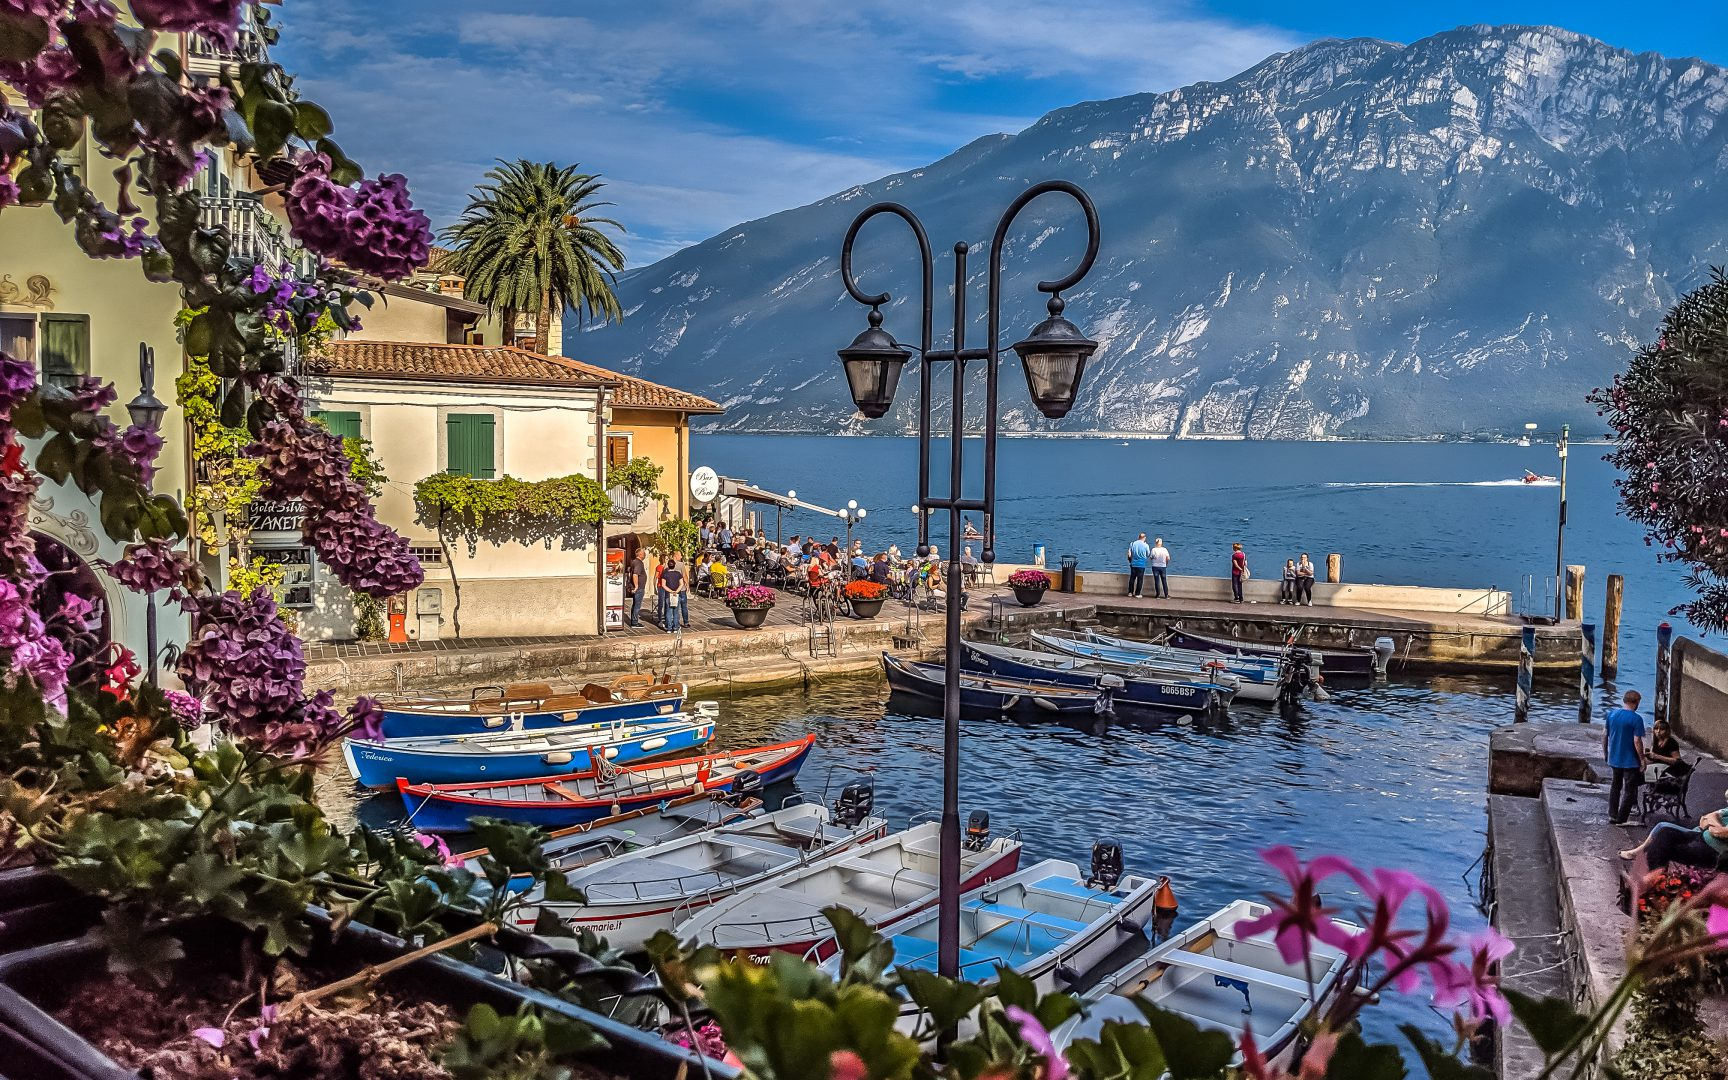 Jezioro Garda Limone sul Garda